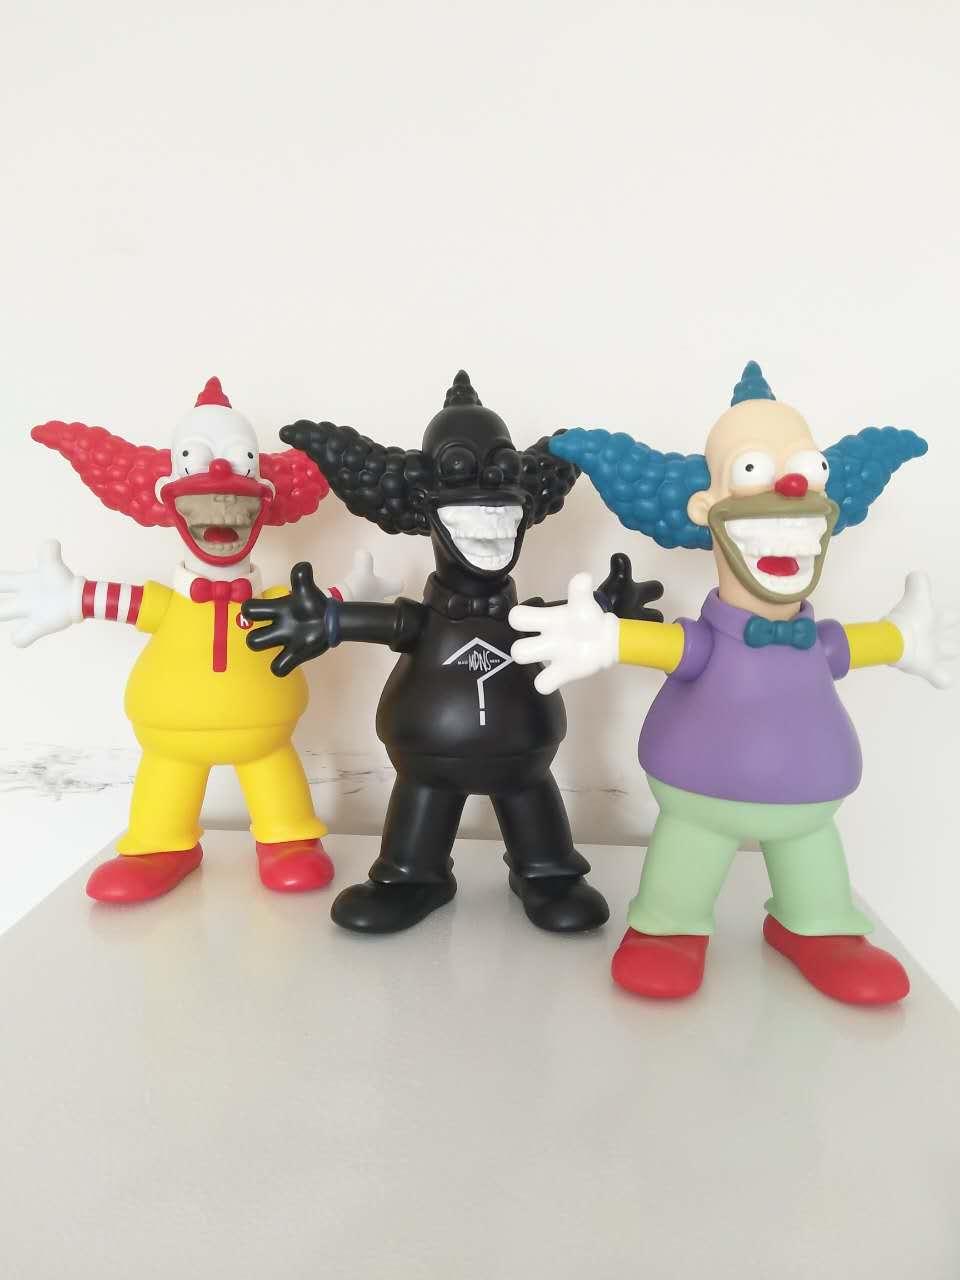 MADNESS 四方联名全球限量模型玩具 余文乐 玩偶